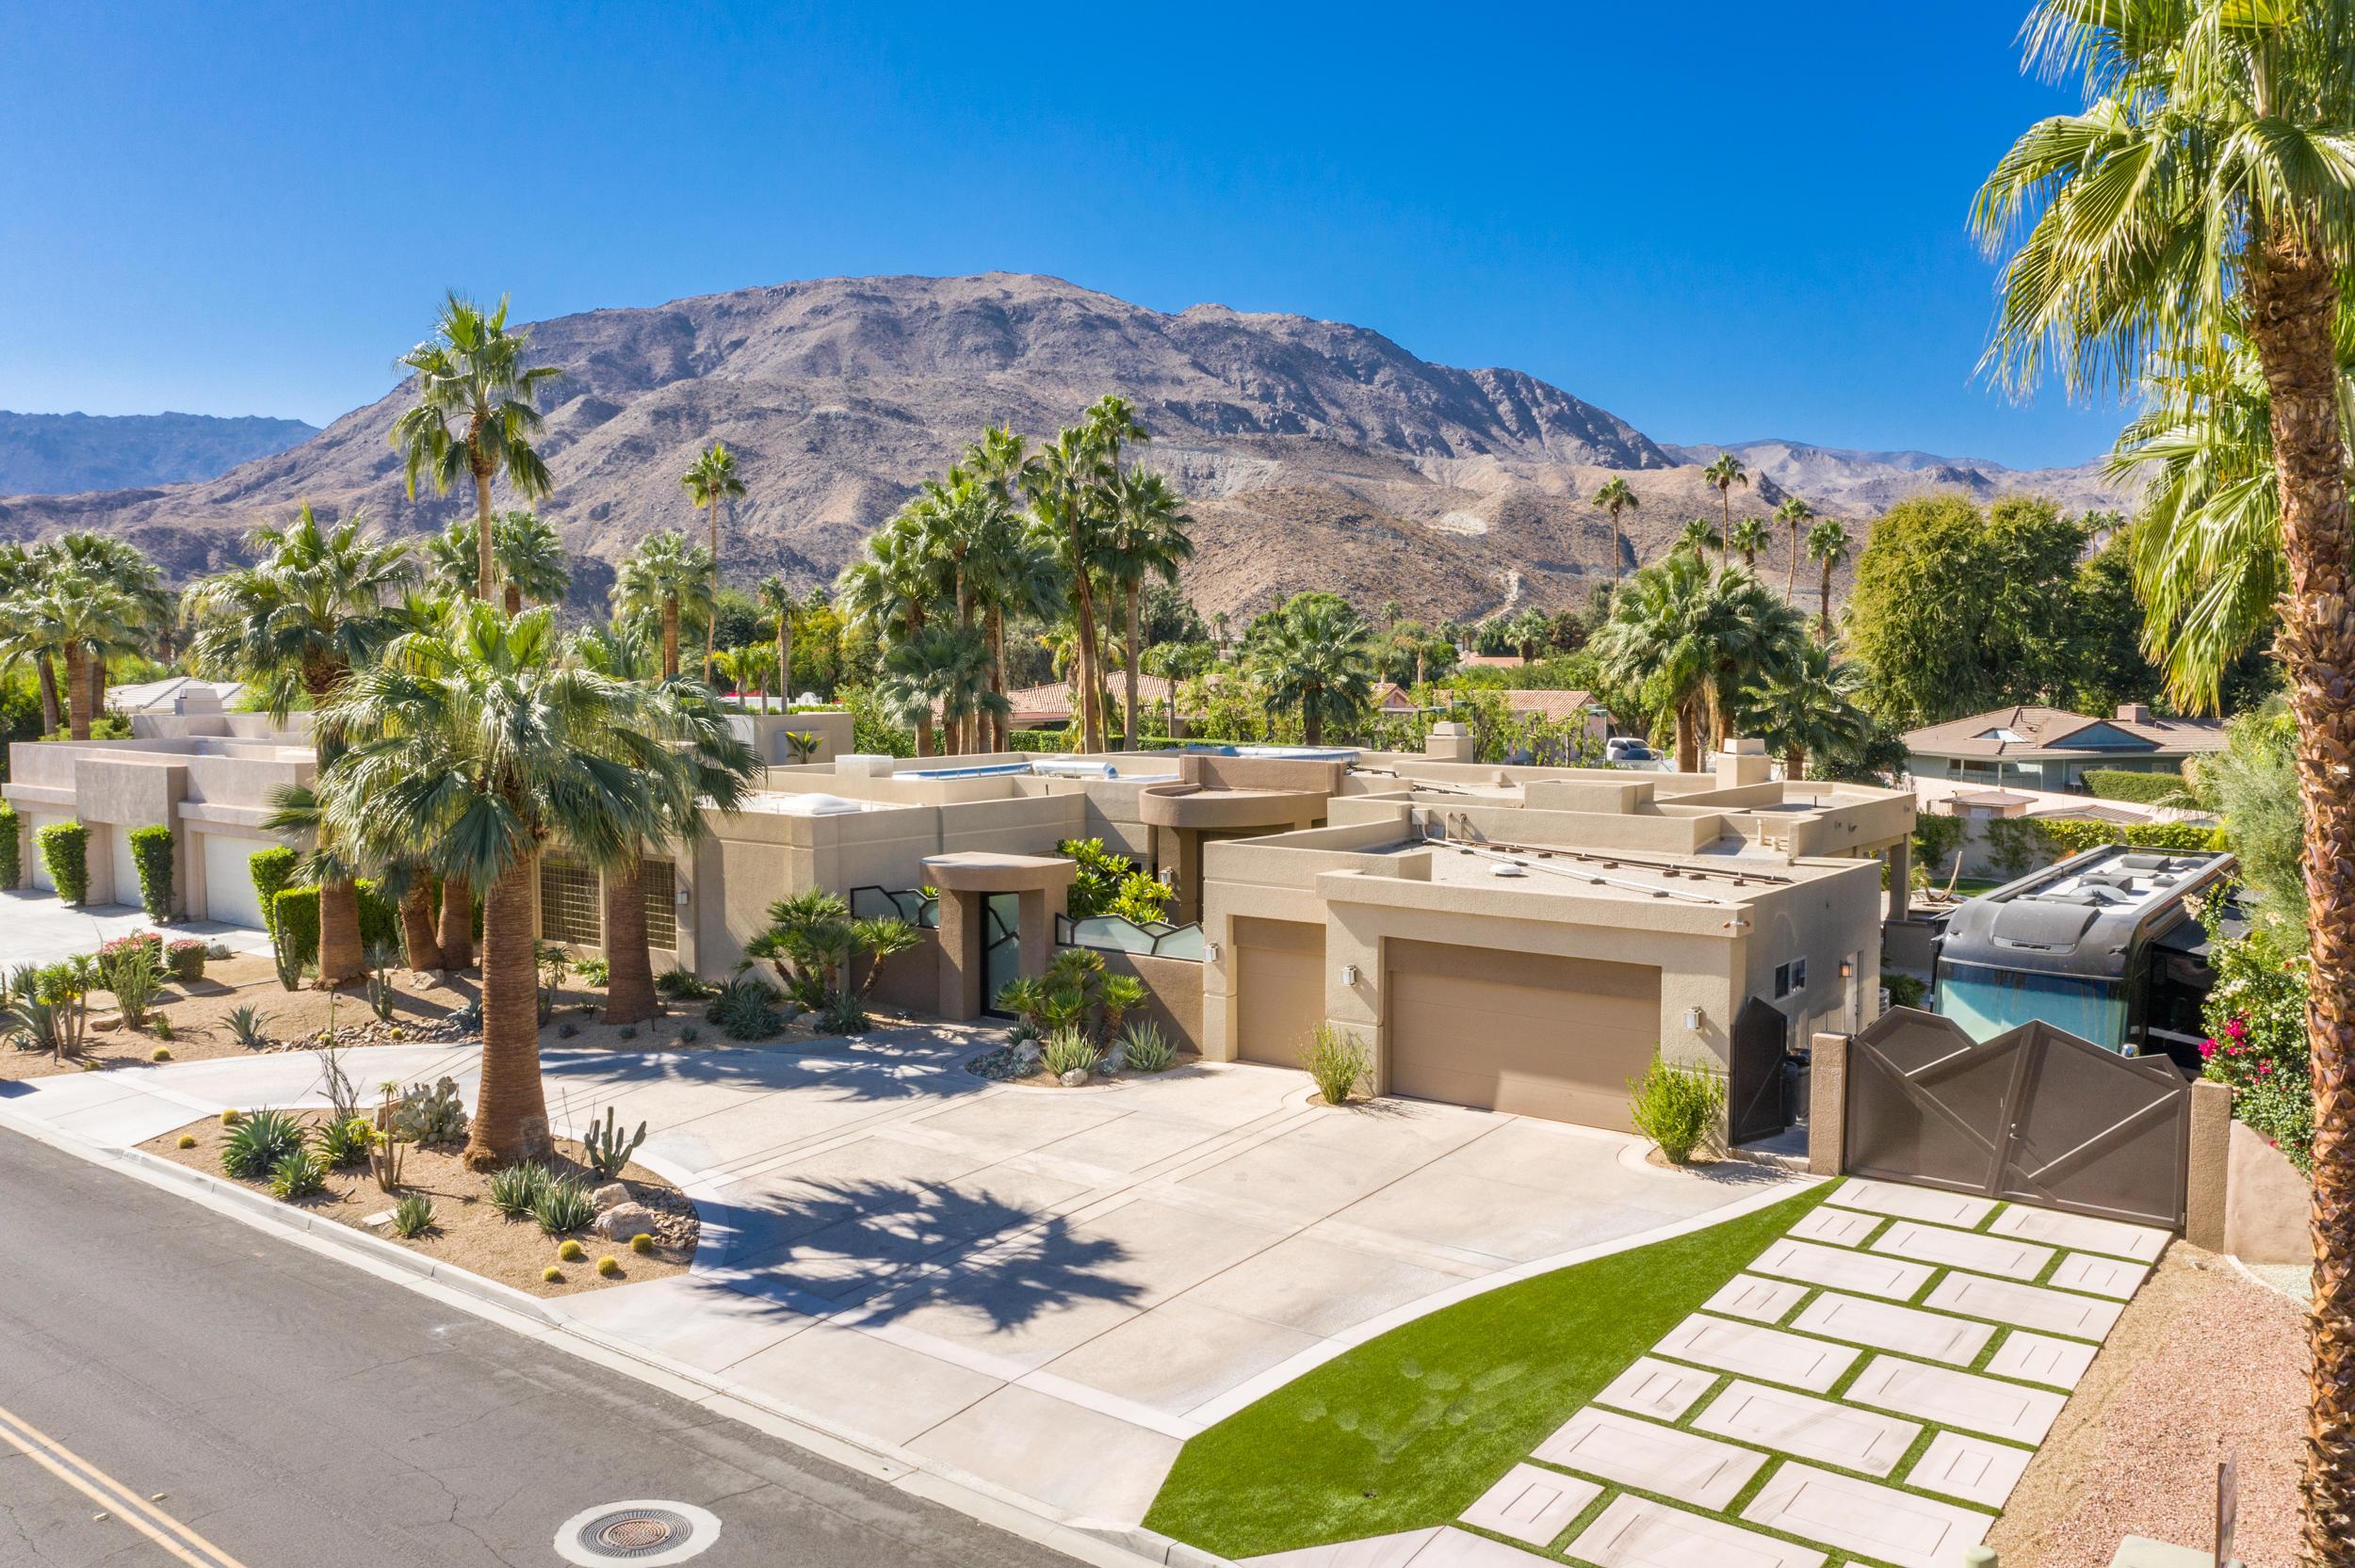 Photo of 43197 Joshua Road, Rancho Mirage, CA 92270